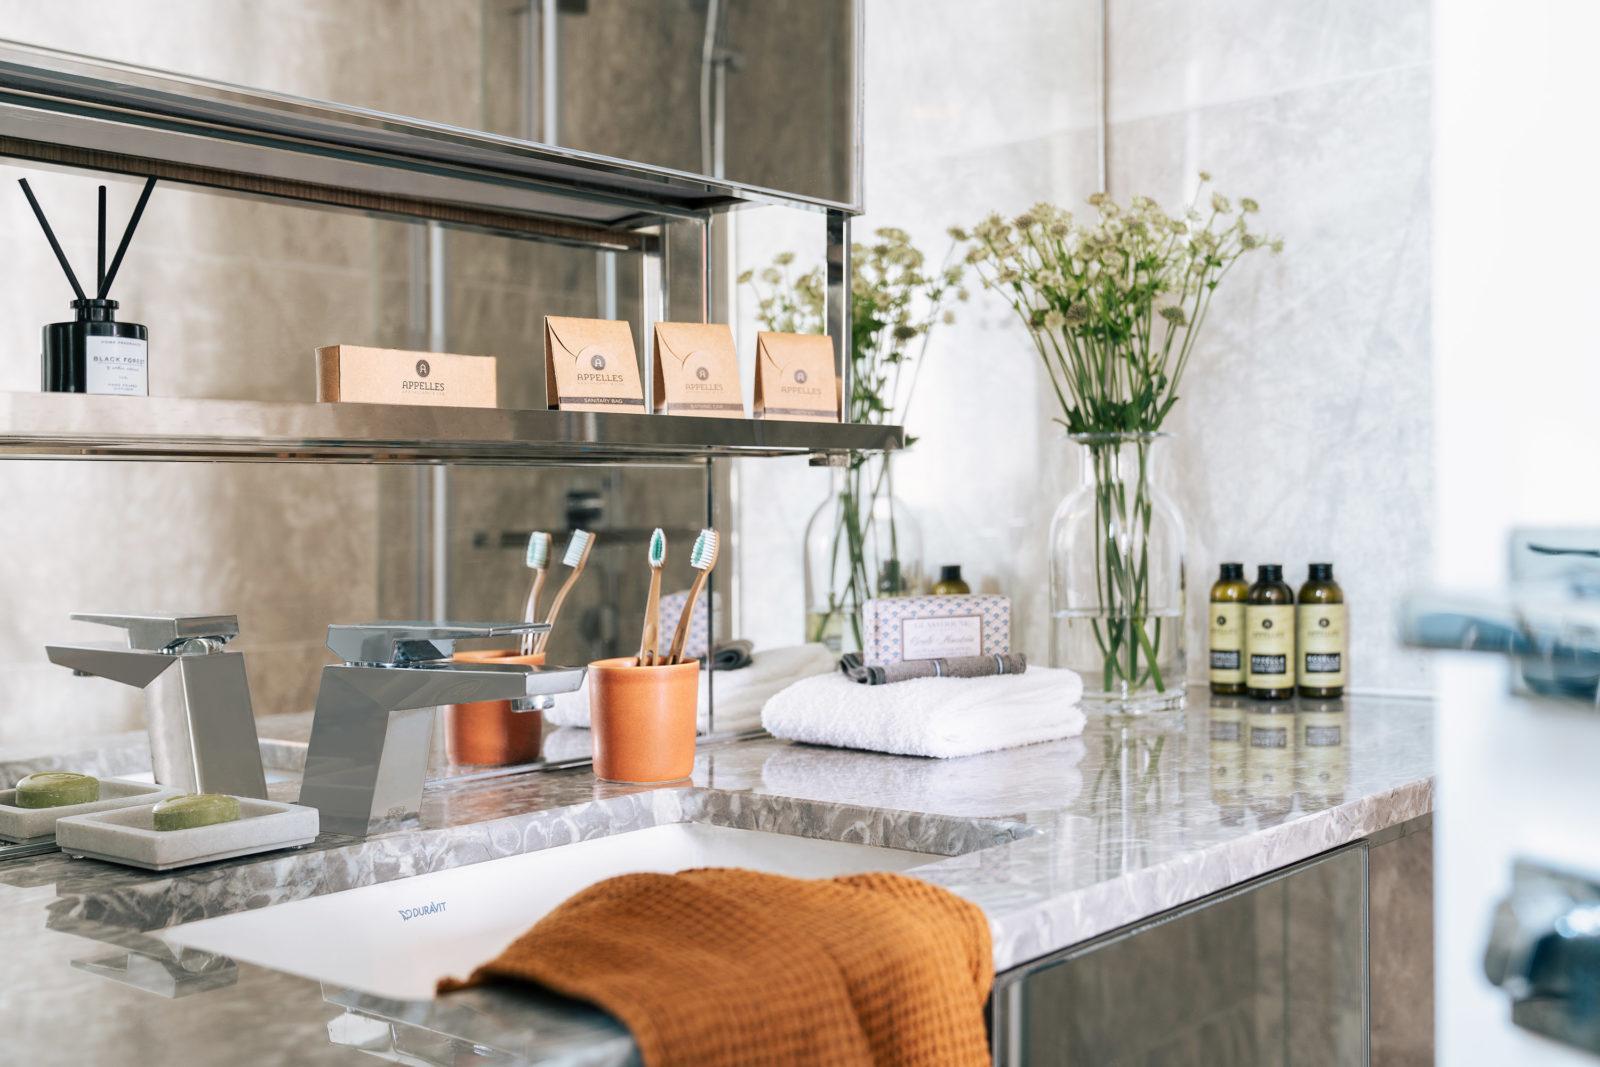 APPELLES 浴室洗漱用品 (放在登记入住时「入住欢迎礼品」内)